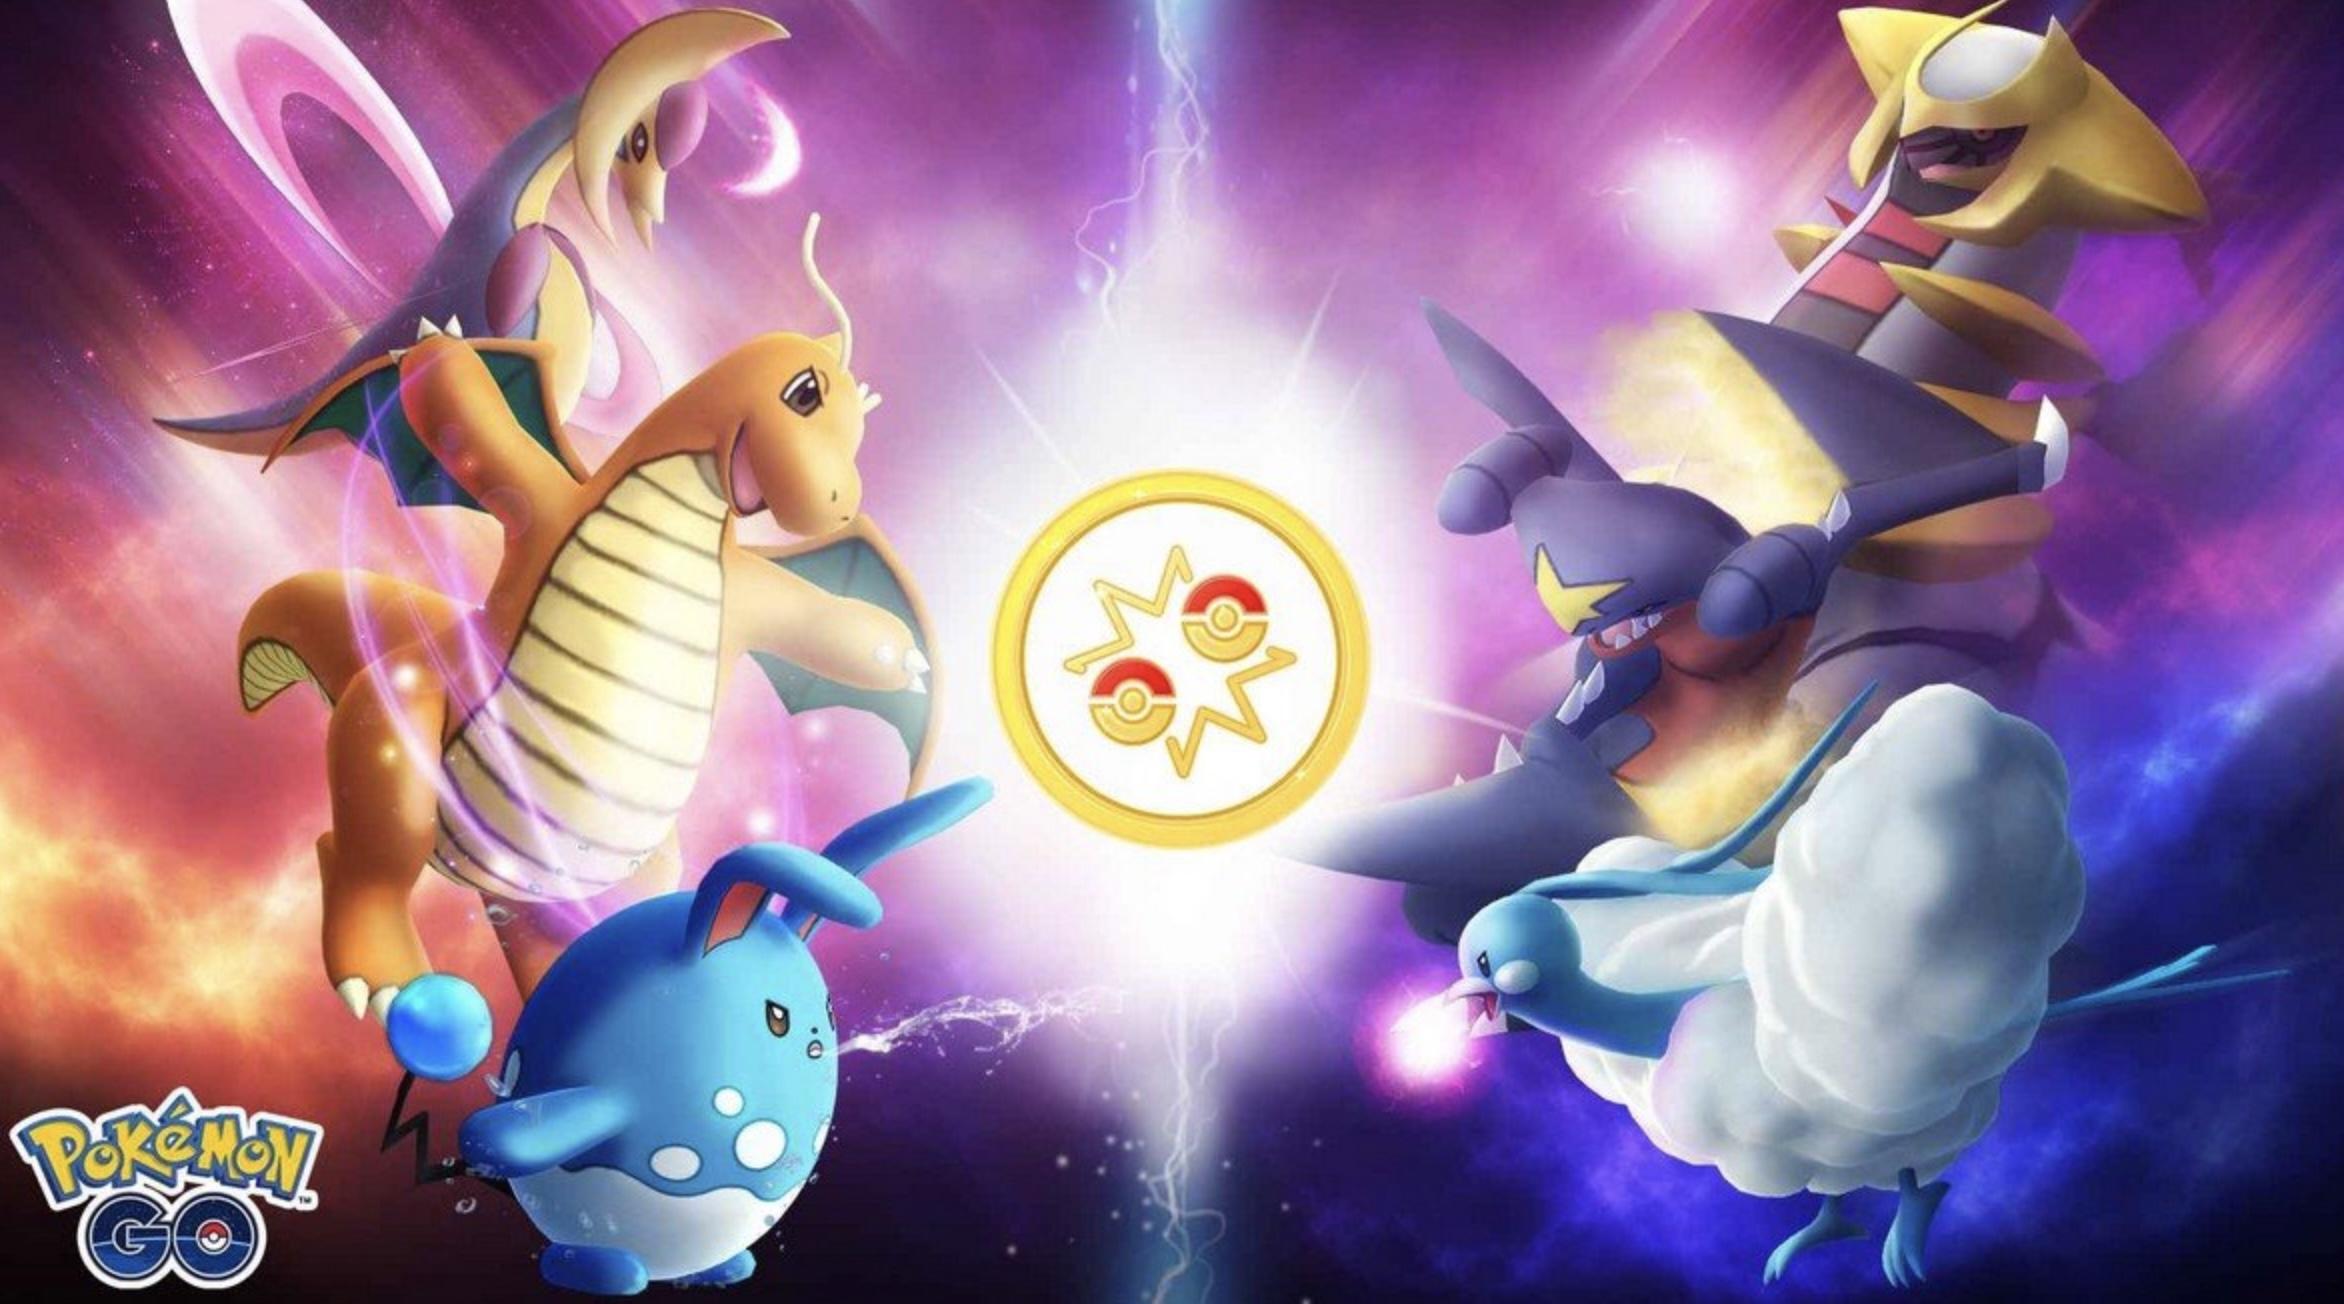 Pokemon Go Upcoming Events May 2021